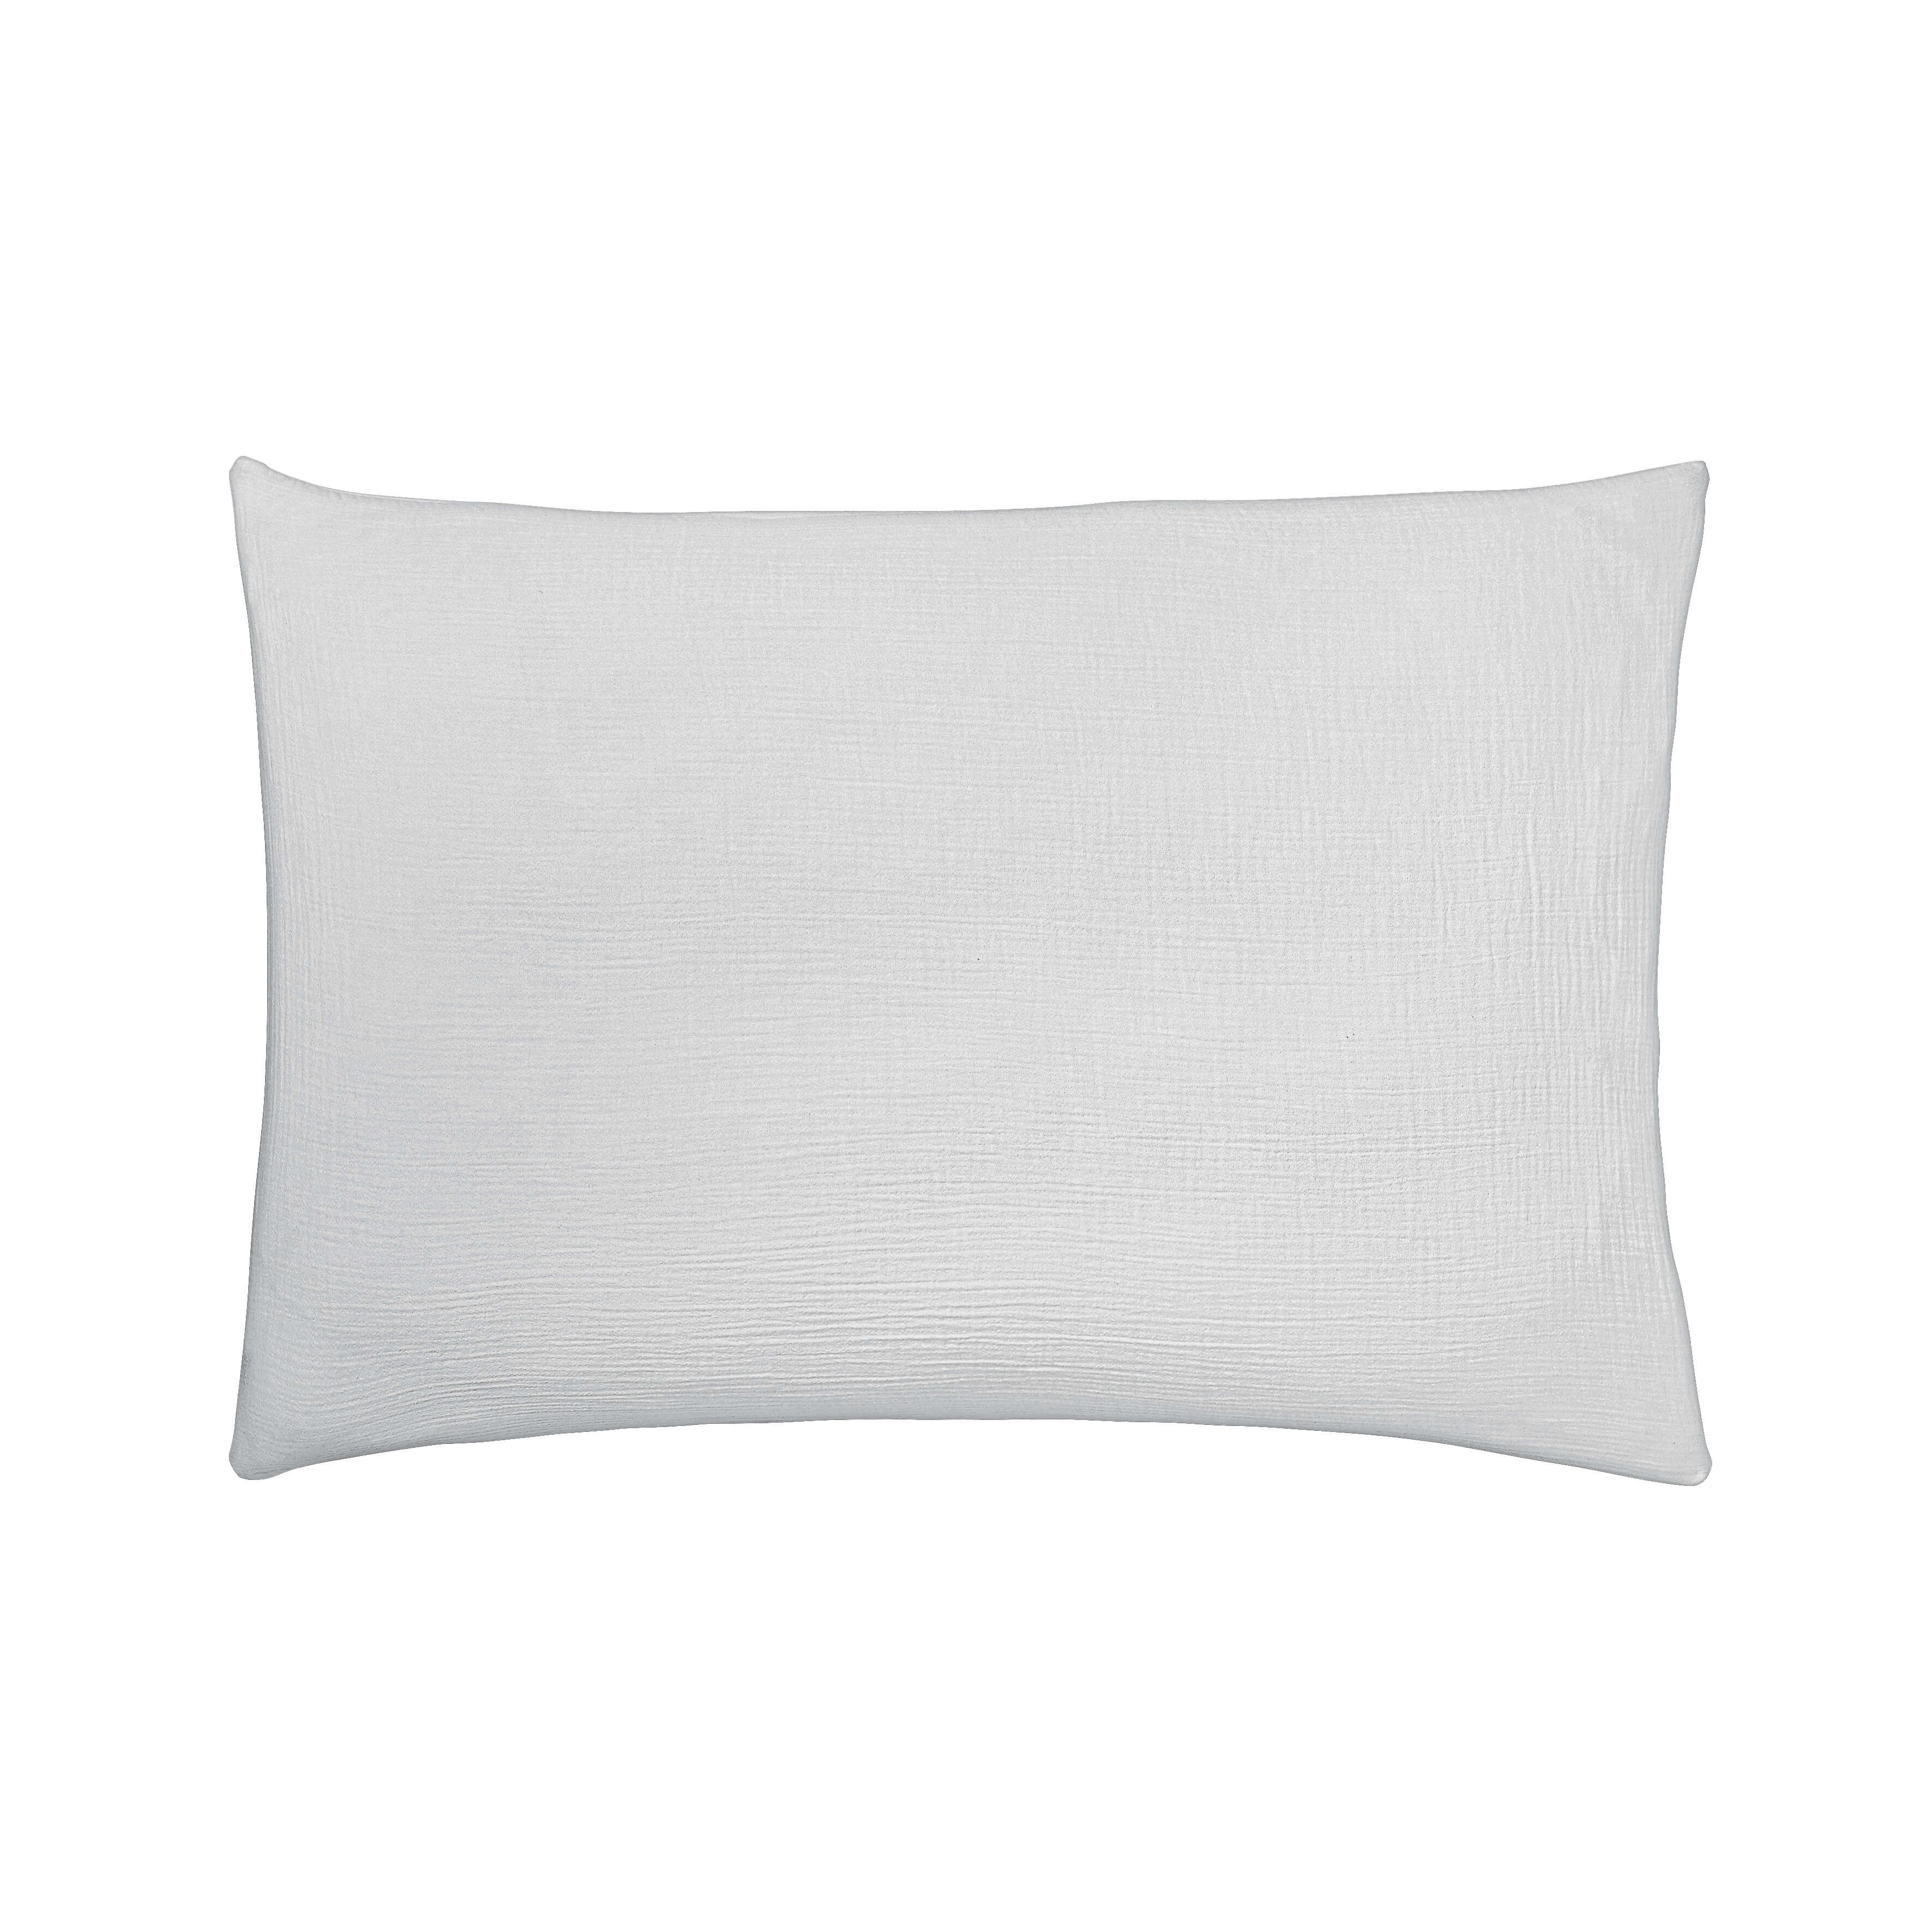 Taie d'oreiller rectangle brume en coton gris 50x75